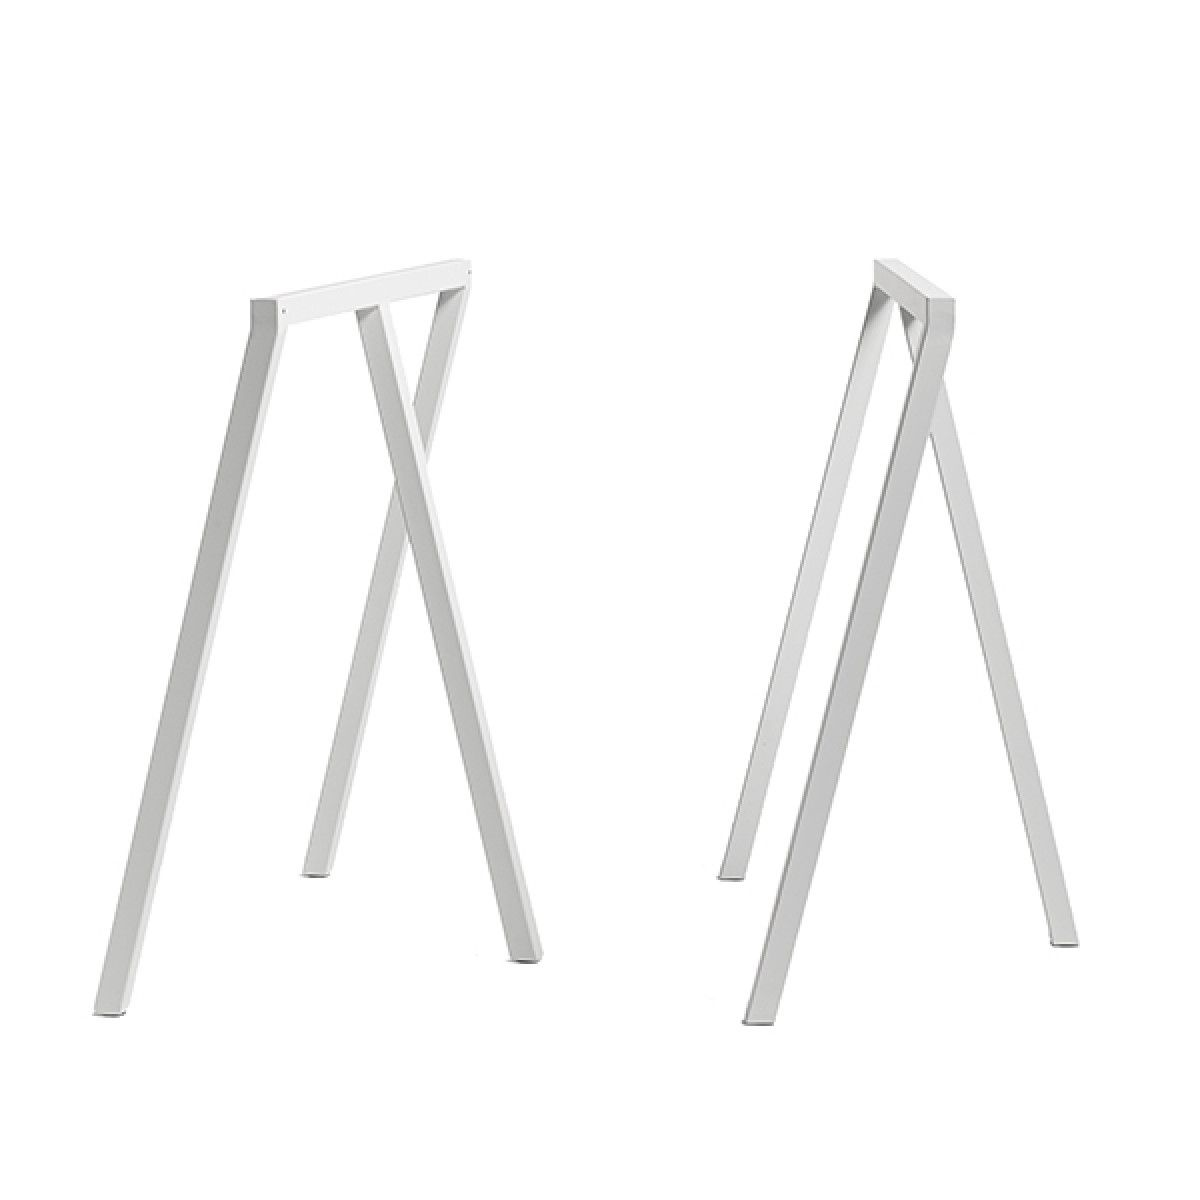 hay bordben Hay Loop Stand Frame bordben   hvid |  THE WISHLIST  | Pinterest hay bordben